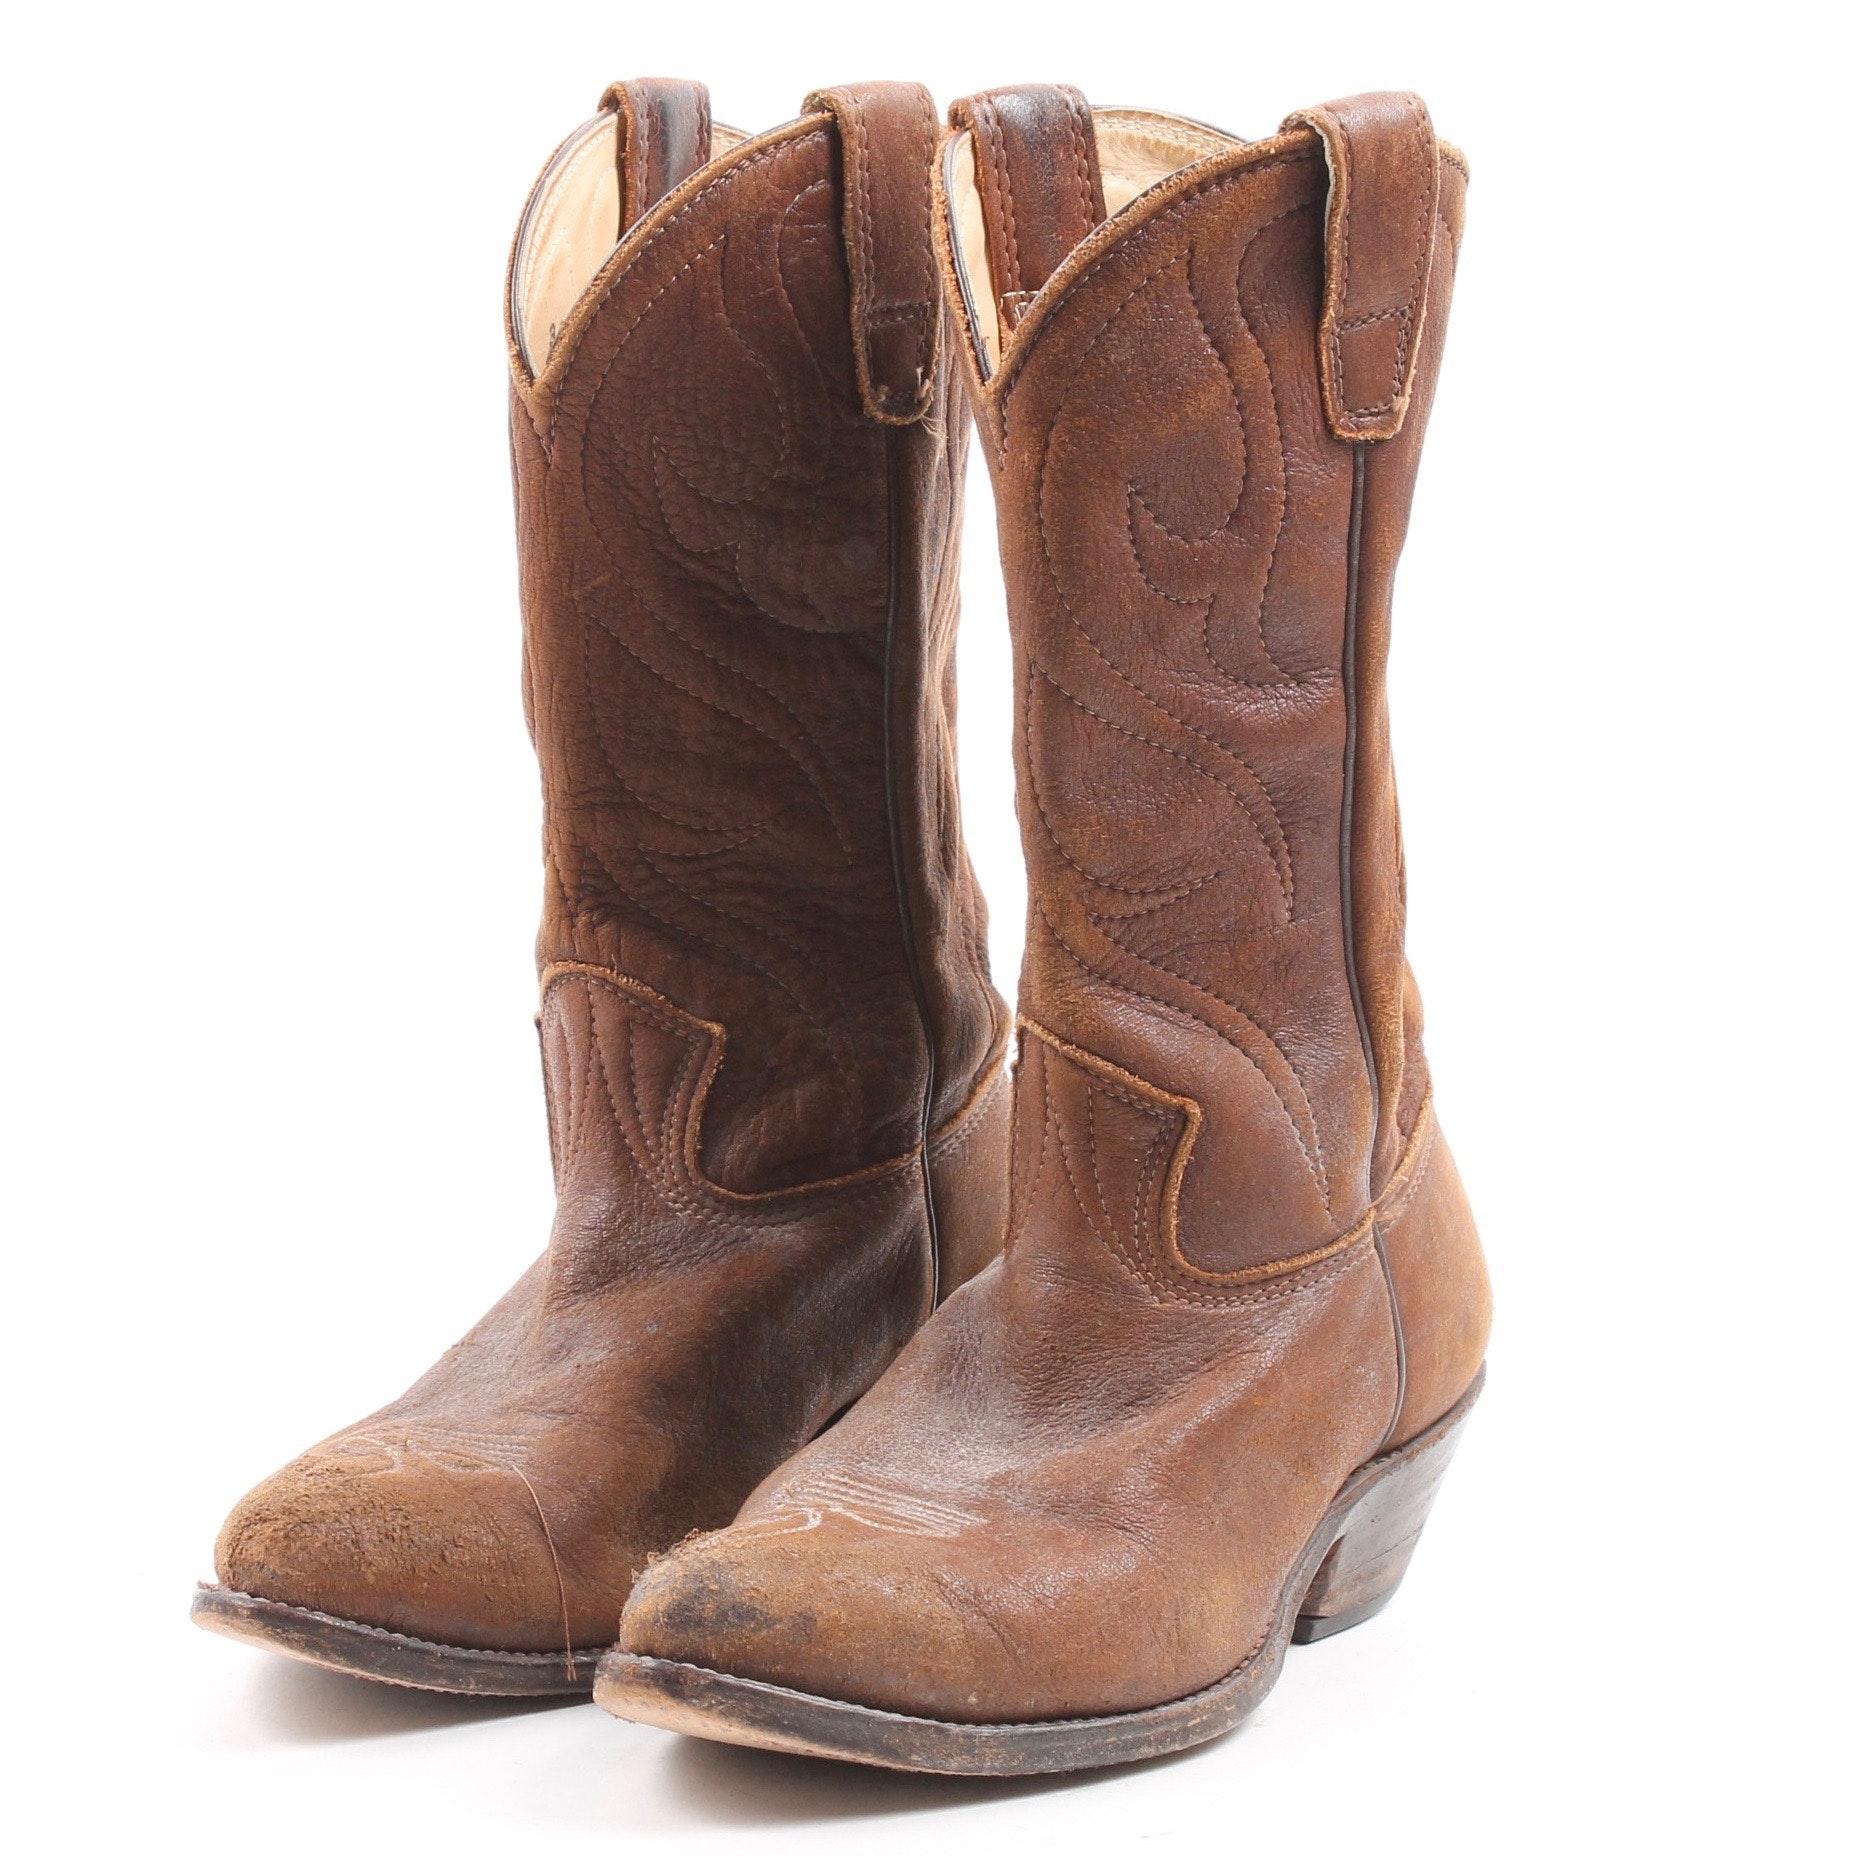 1977 Vintage Stewart Brown Raw Leather Cowboy Boots